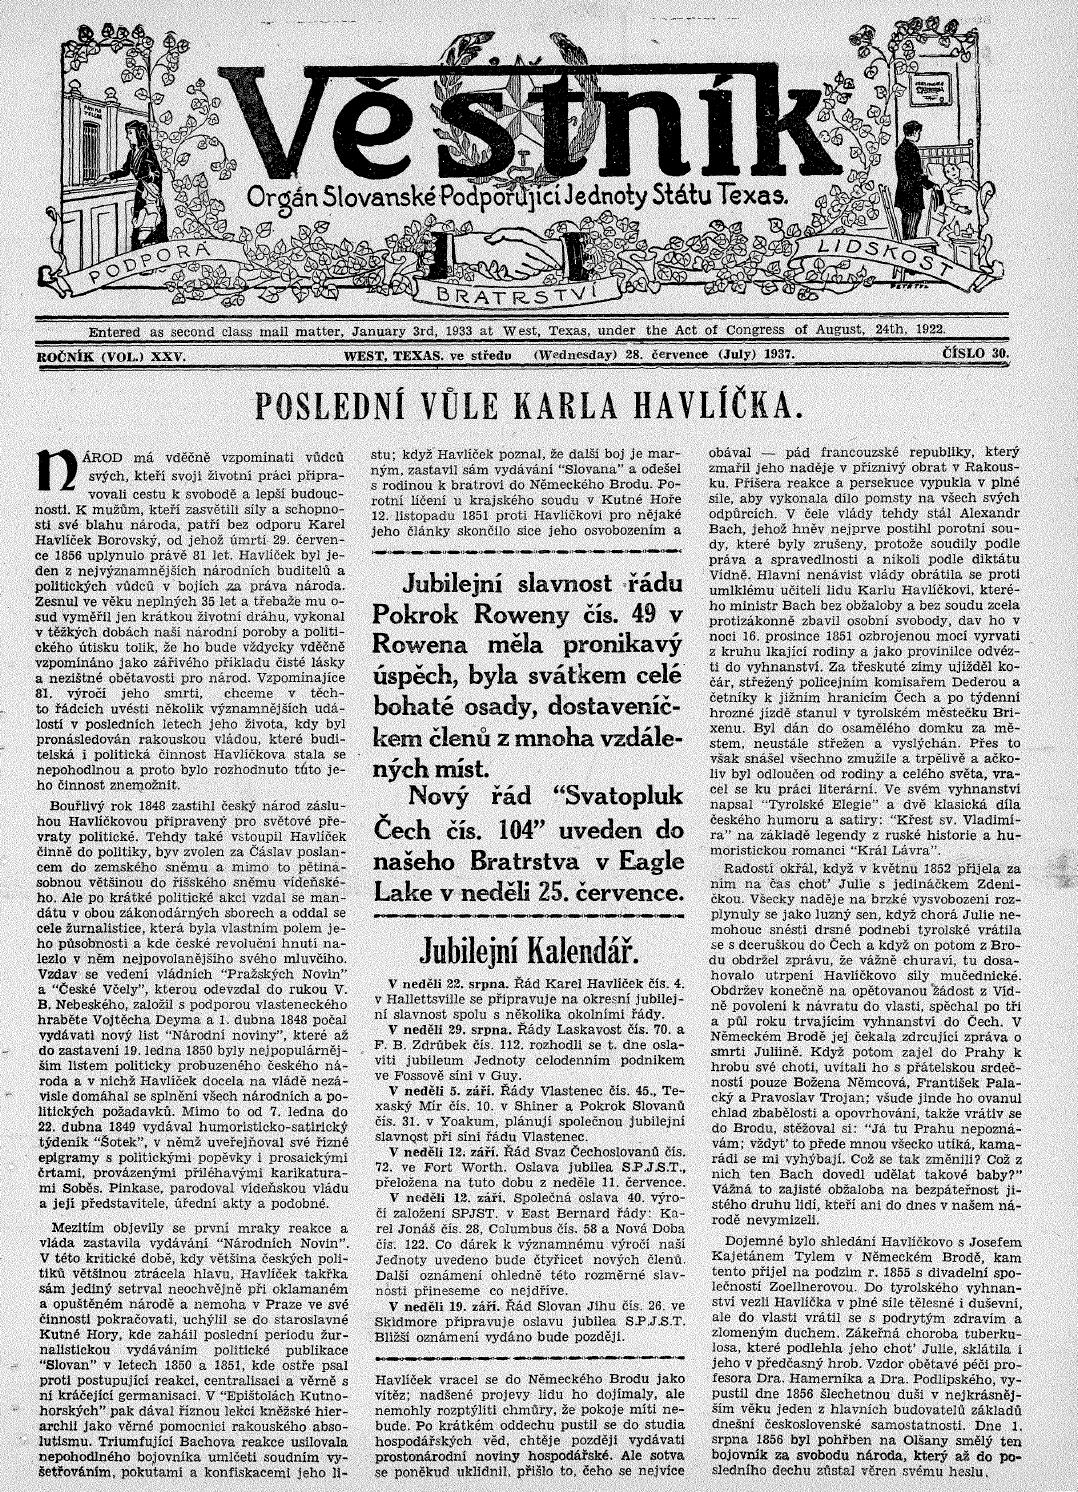 Vestnik 1937 07 28 by SPJST - issuu 7117b3a659